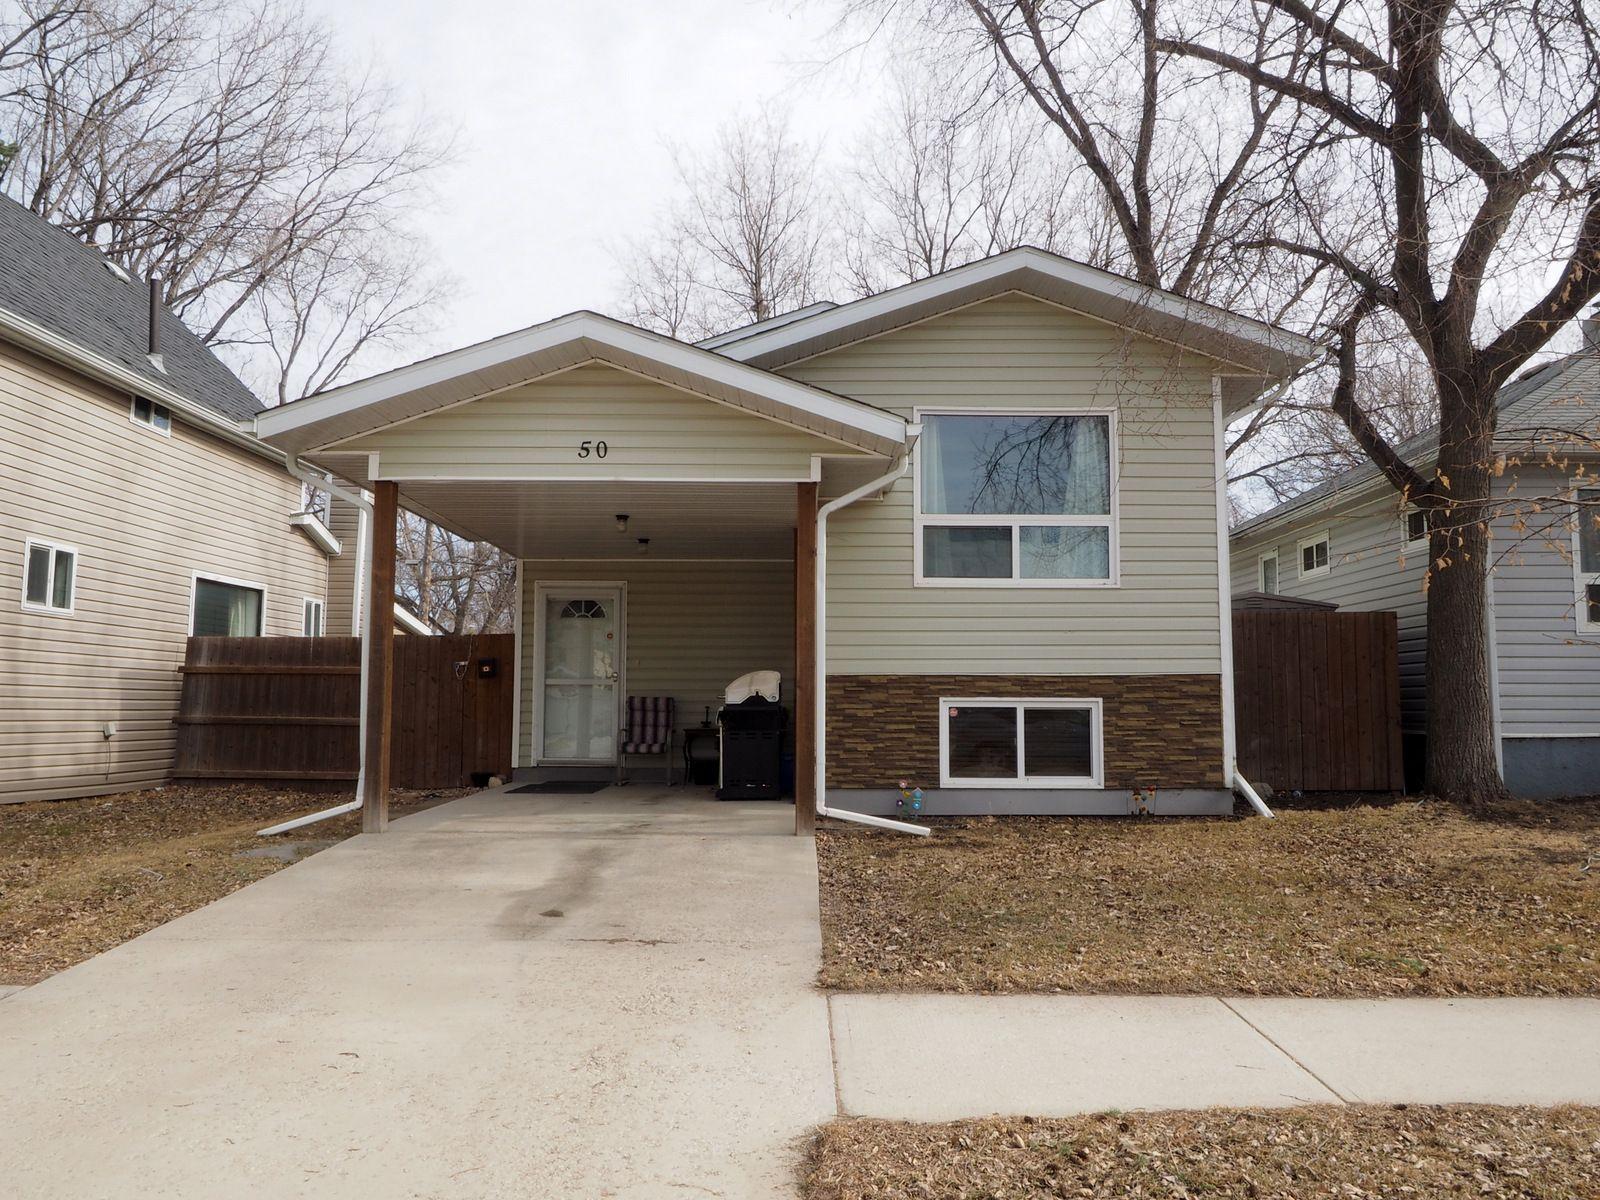 Main Photo: 50 1st Street SW in Portage la Prairie: House for sale : MLS®# 202105577